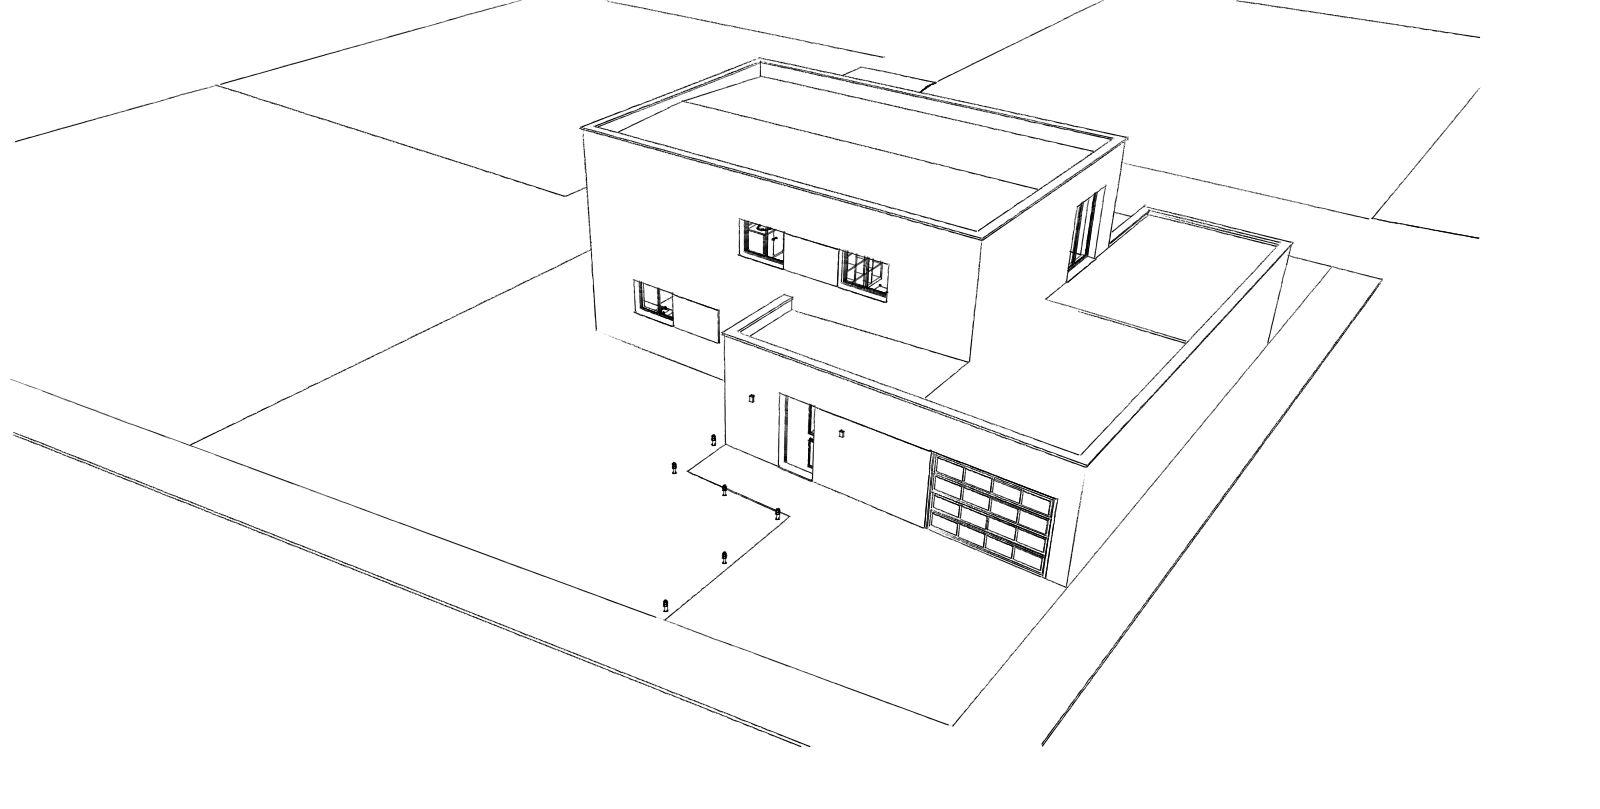 permis de construire architecte Lille 2